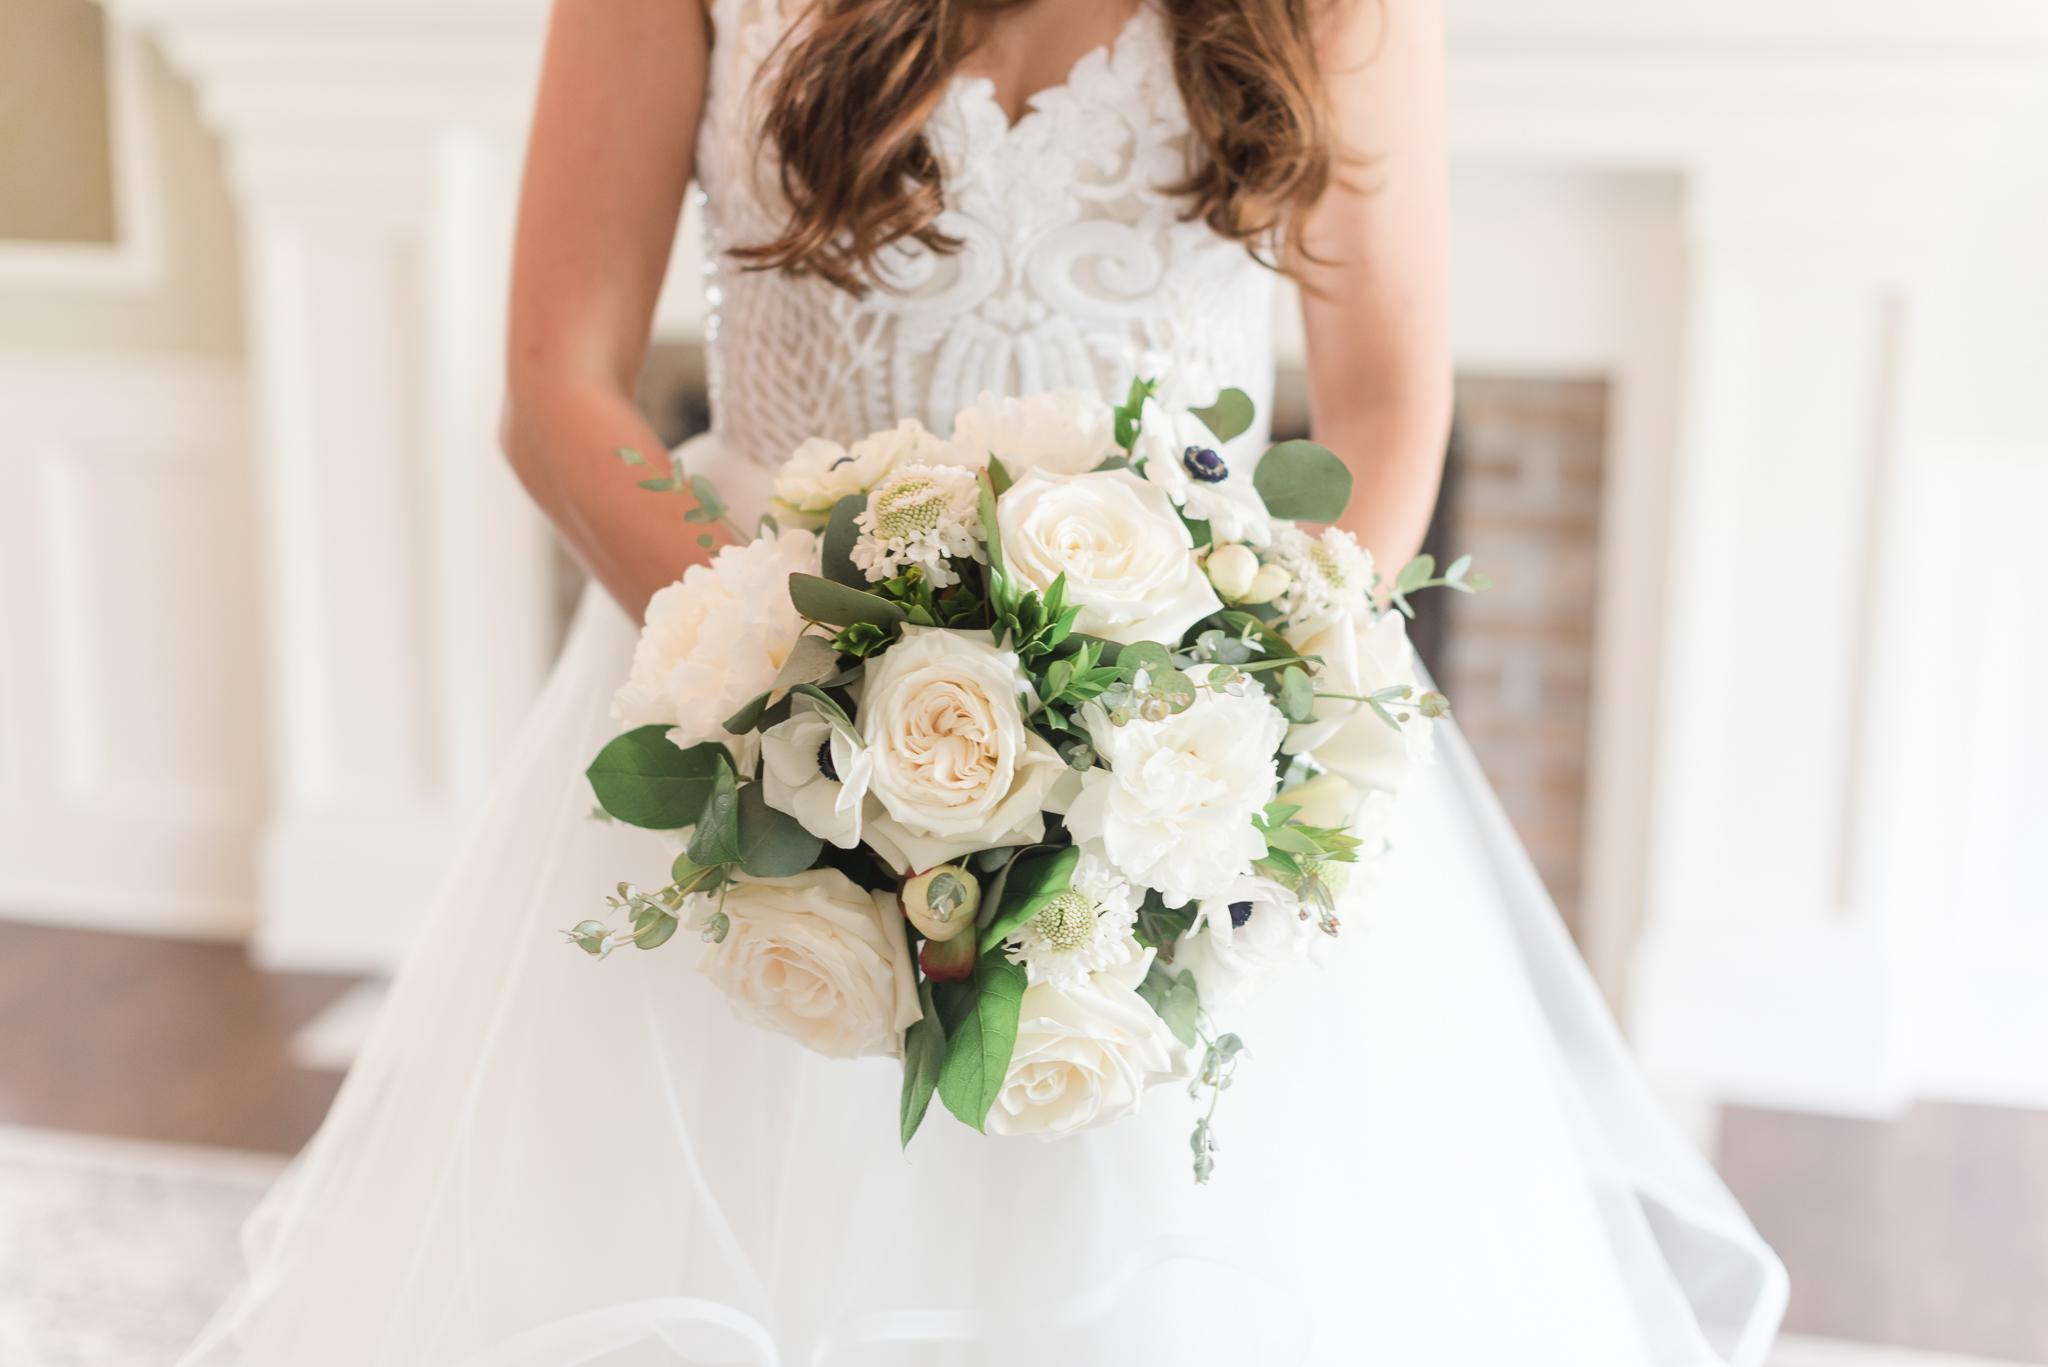 Black Iris Estate Wedding Elegant White with Greenery Luxury High End Flowers-7.jpg